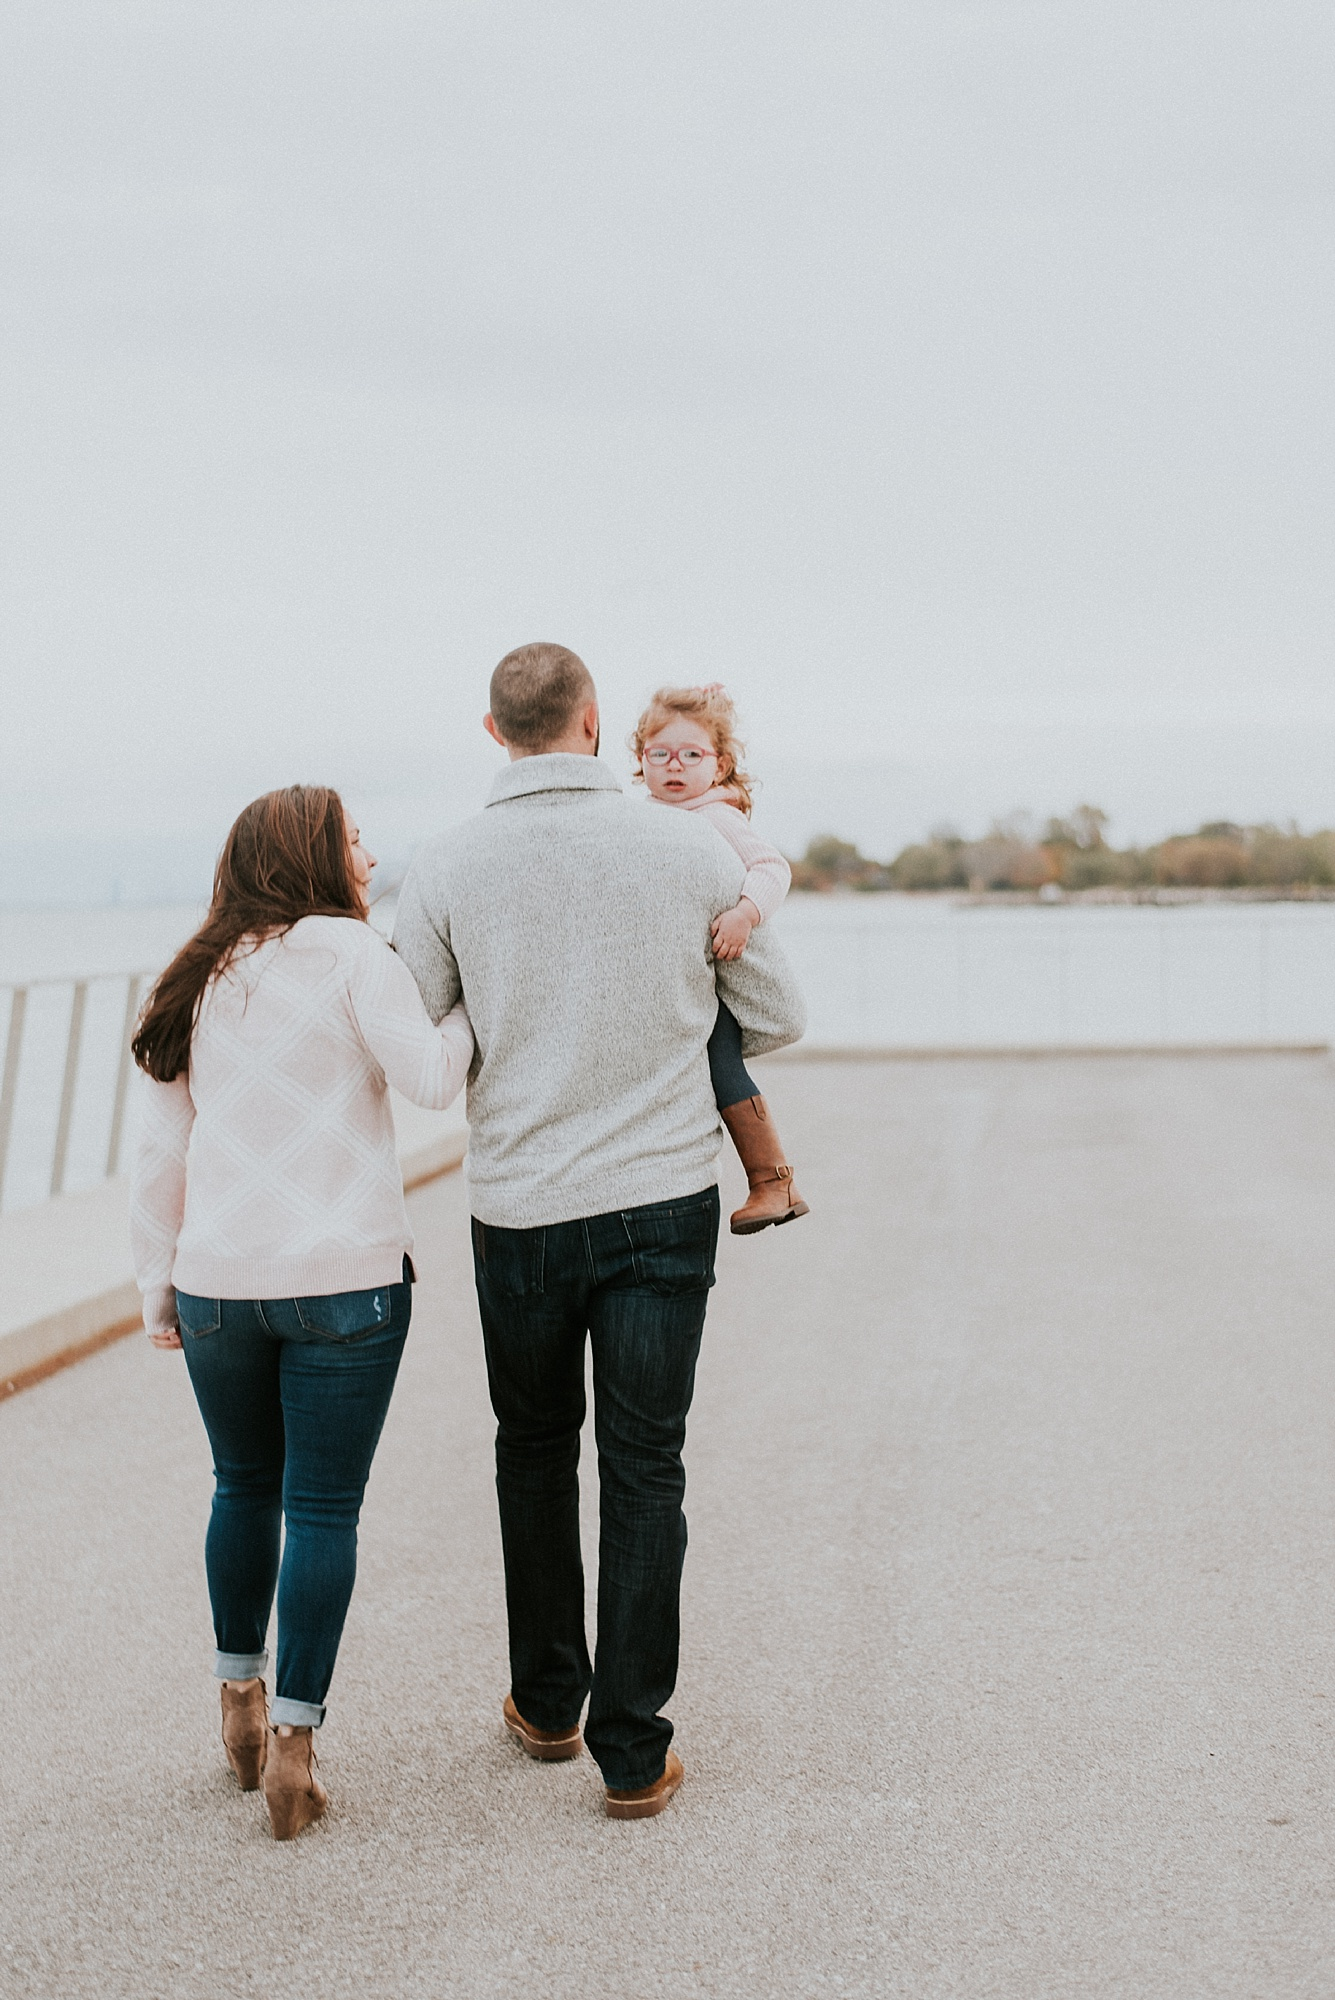 CHICAGO-MATERNITY-FAMILY-PHOTOGRAPHER-LISH-MARIE_0398.jpg